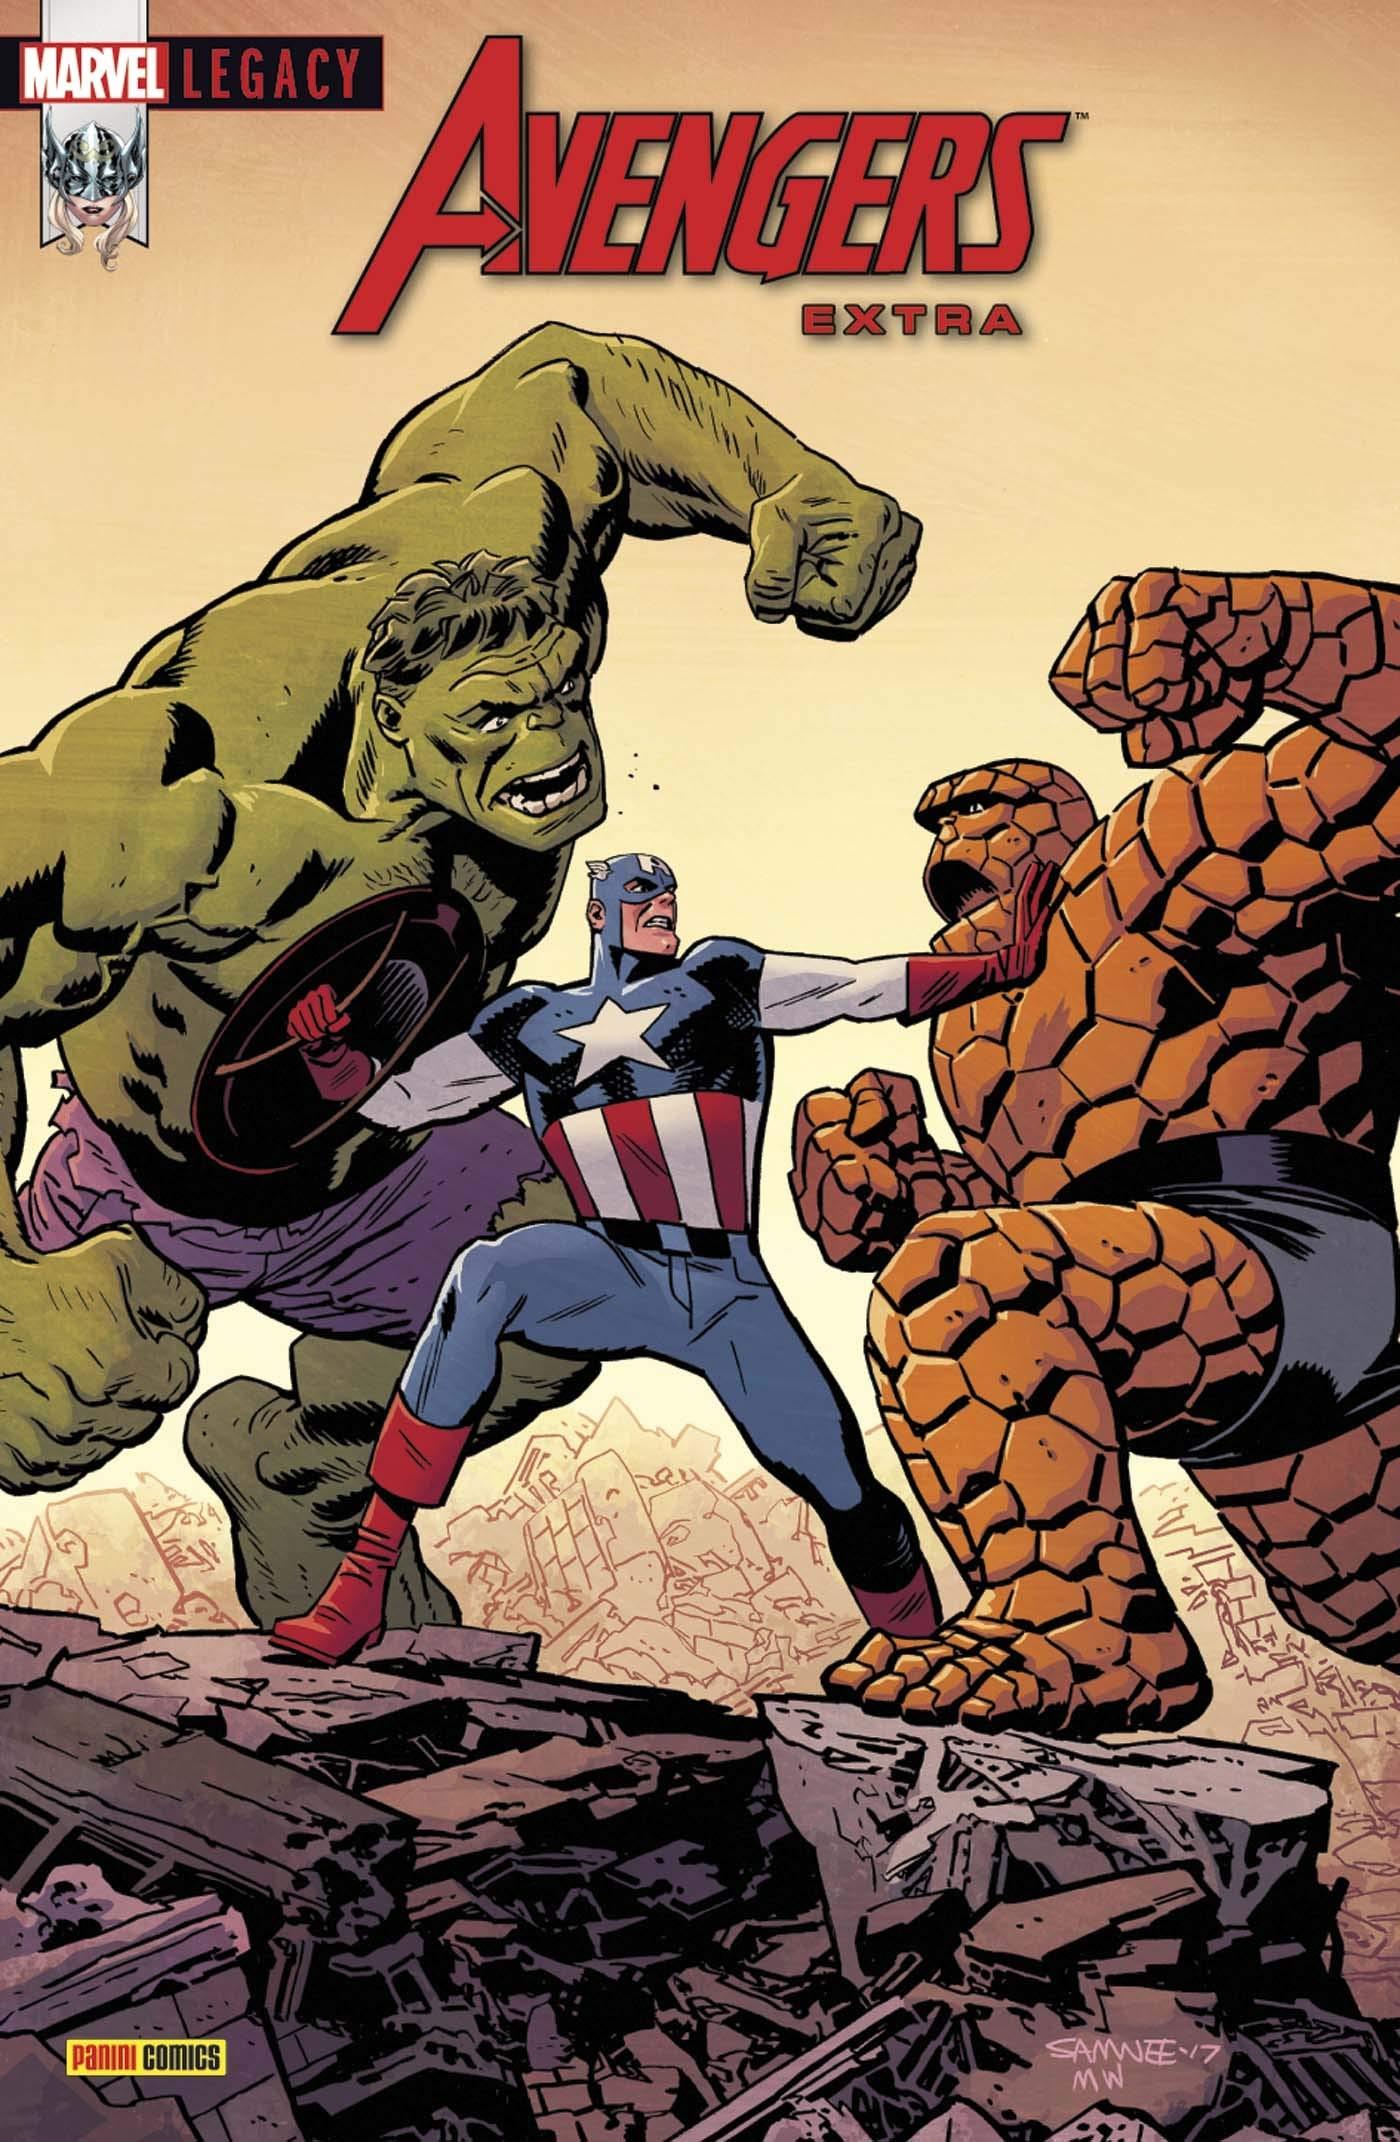 Marvel Legacy - Avengers Extra 3